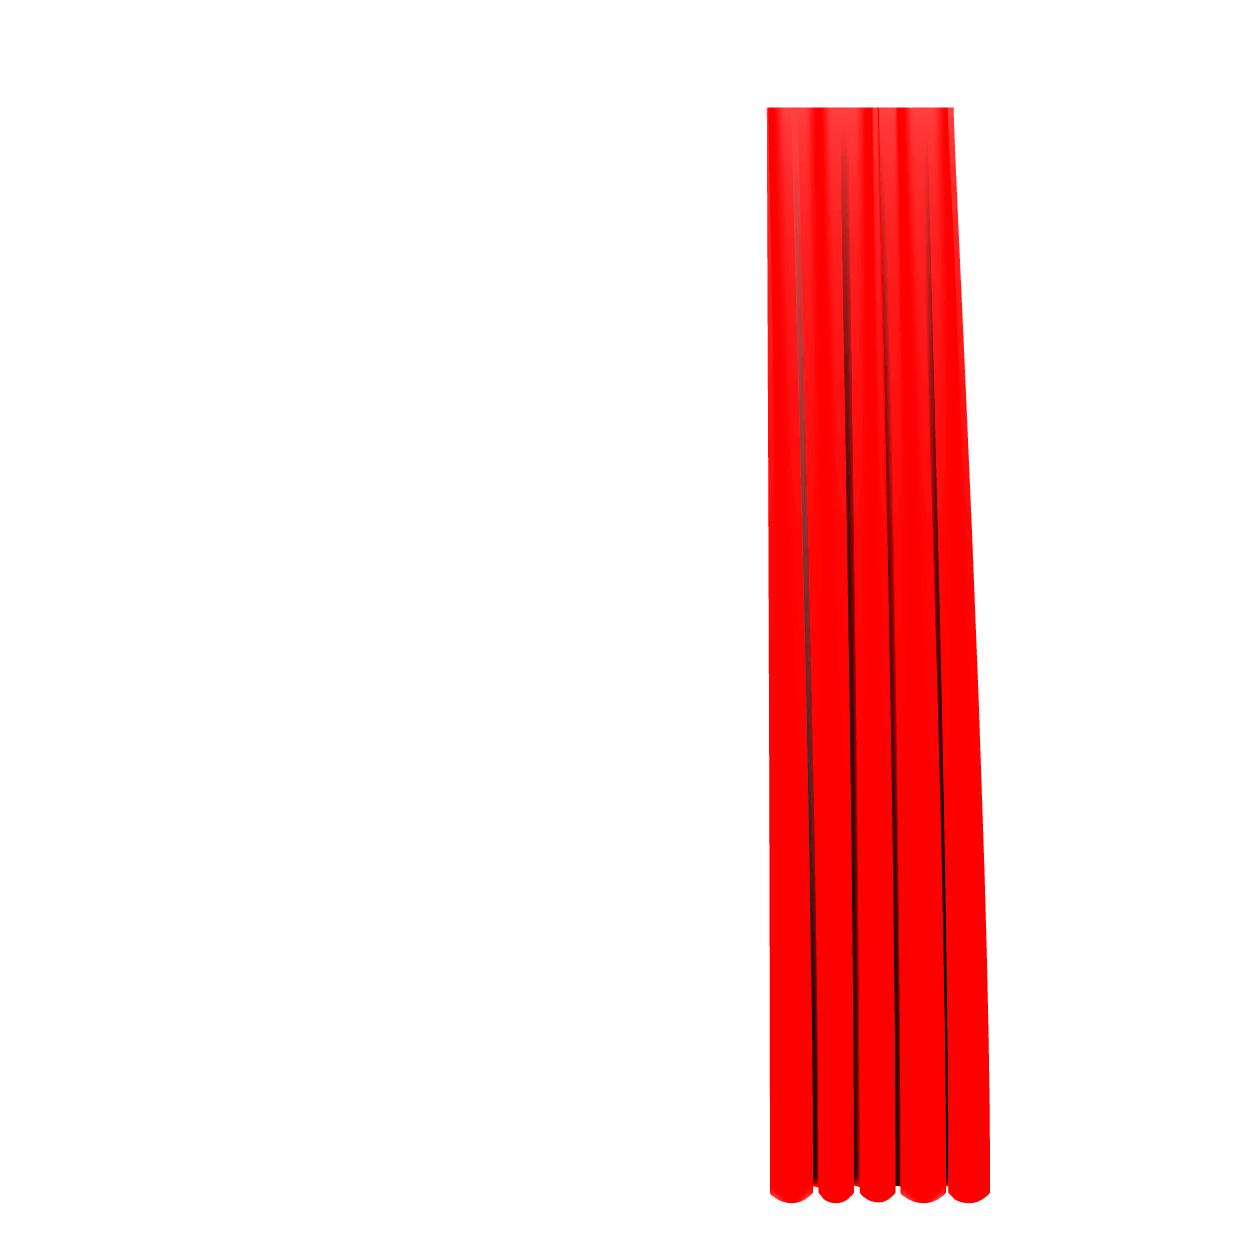 Parametr